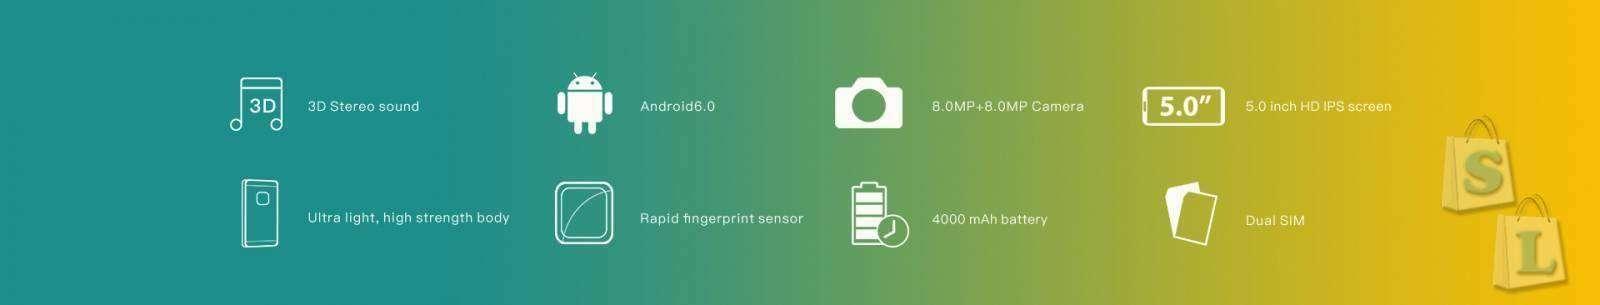 Shopper: Обзор DOOGEE X5 max - обновленная версия бестселлера DOOGEE X5